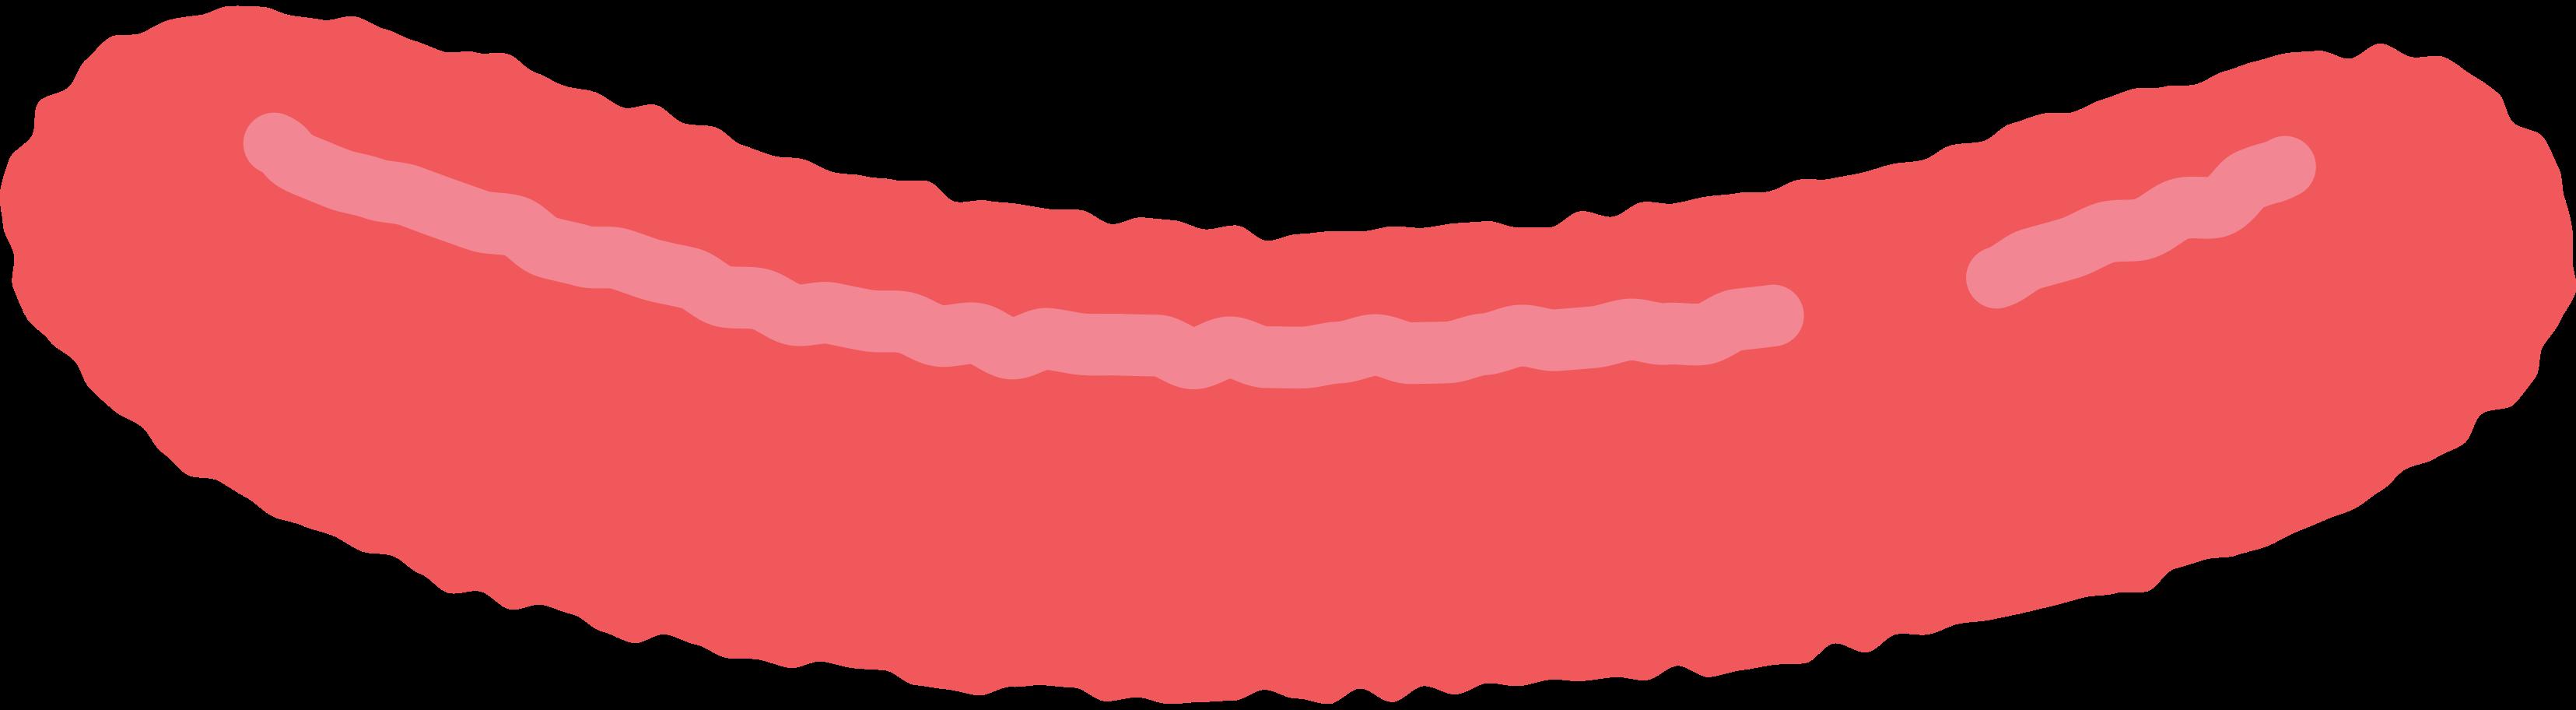 sausage Clipart illustration in PNG, SVG